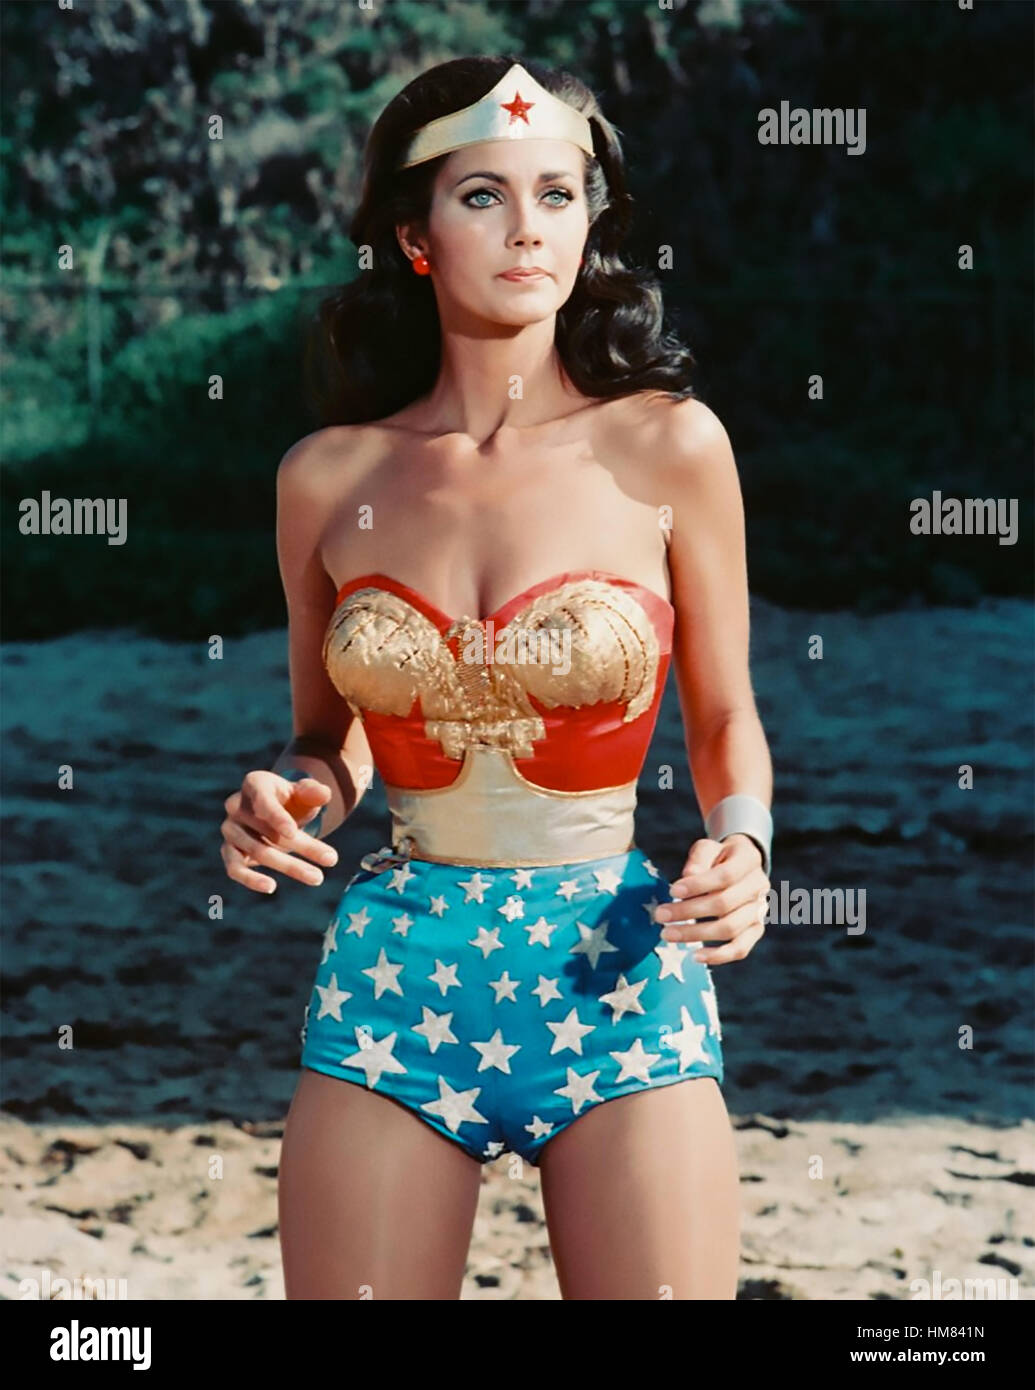 WONDER WOMAN  Warner Bros TV series  1975-79 with Lynda Carter - Stock Image